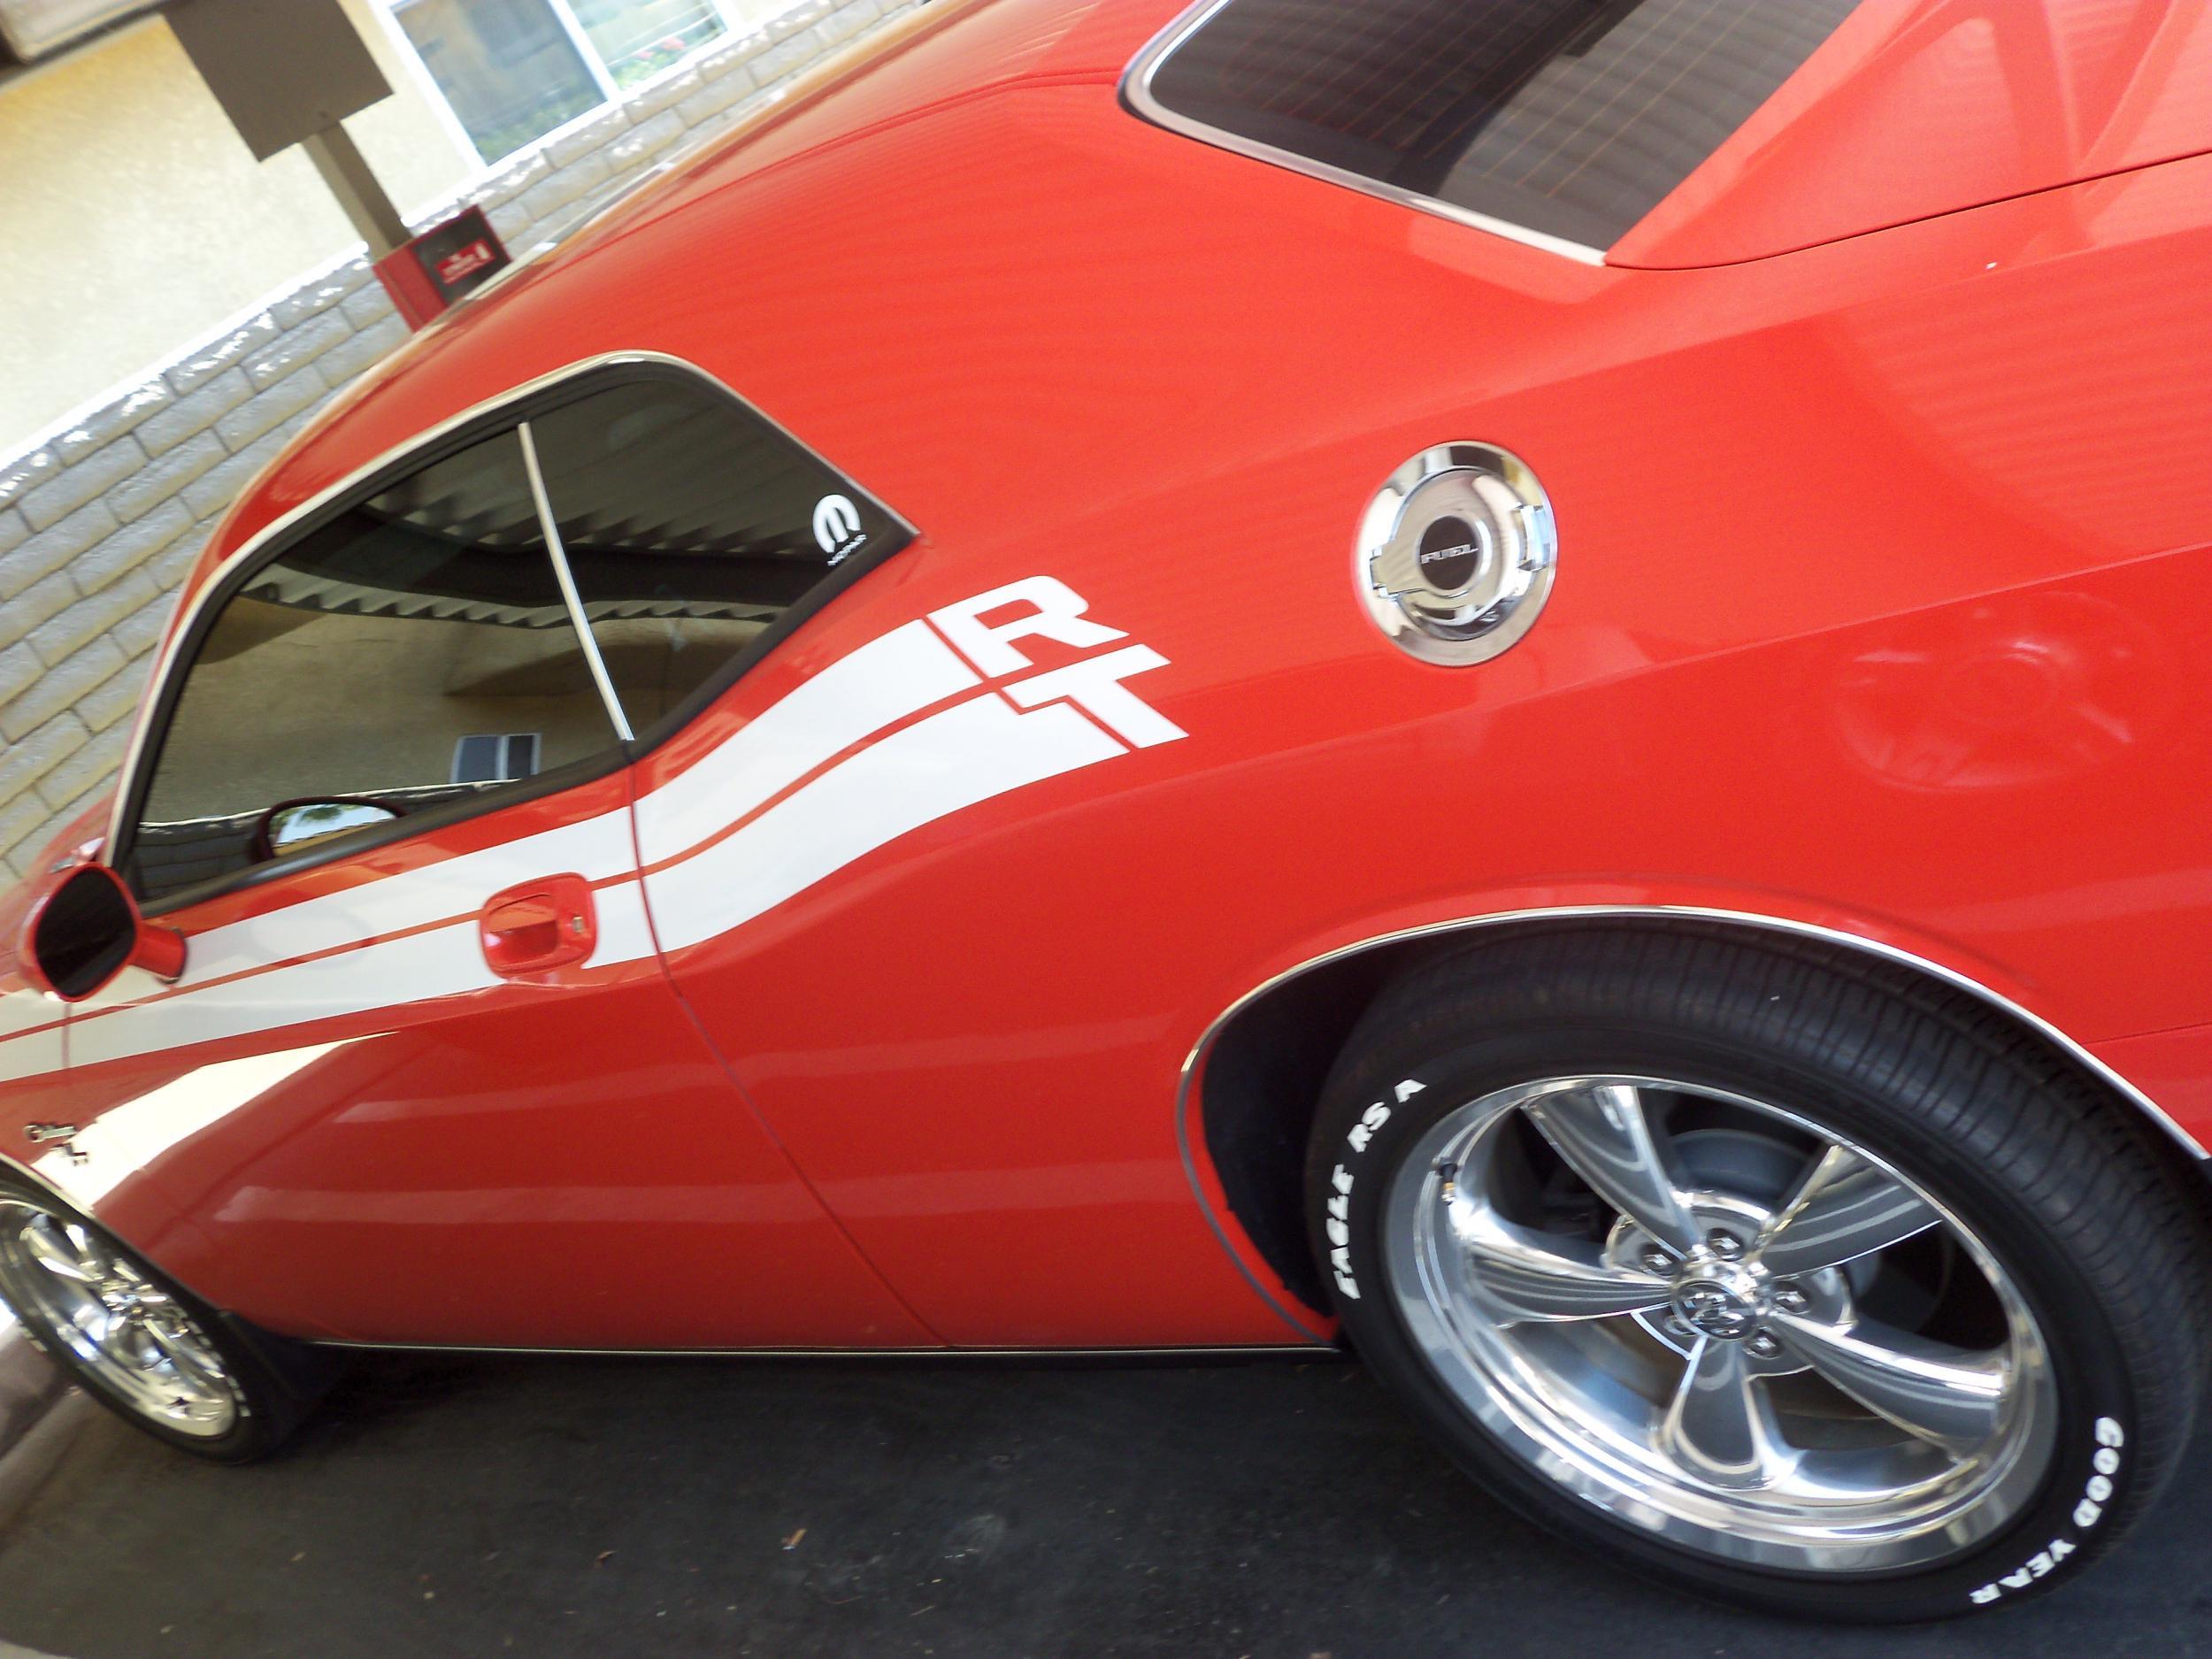 Hemi and Header Orange Challengers-tires-002.jpg